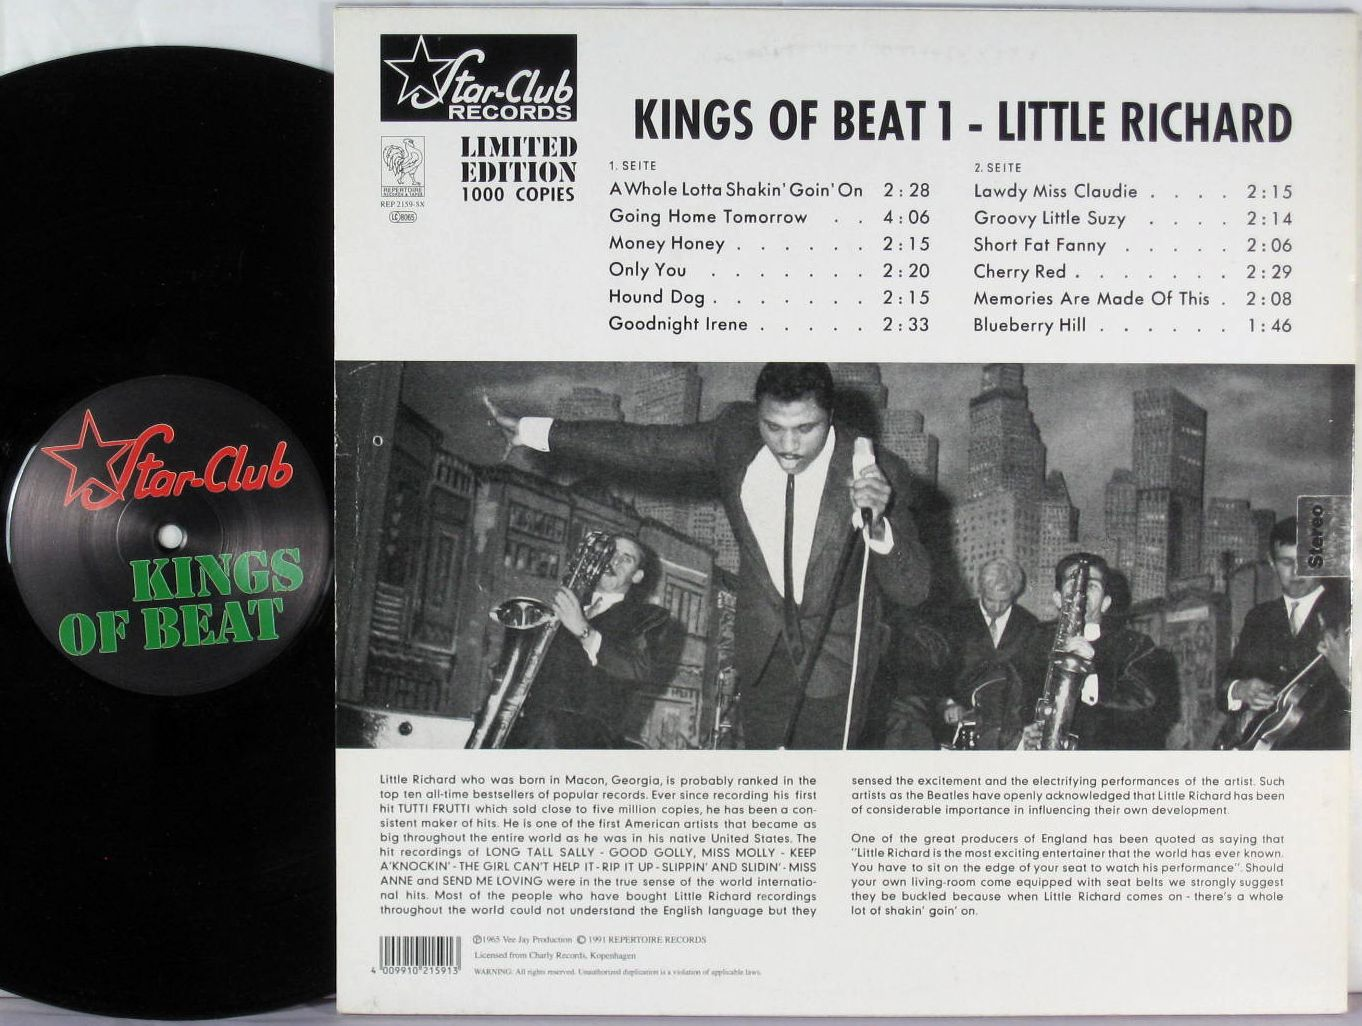 Little Richard Star Club Kings Of Beat 1